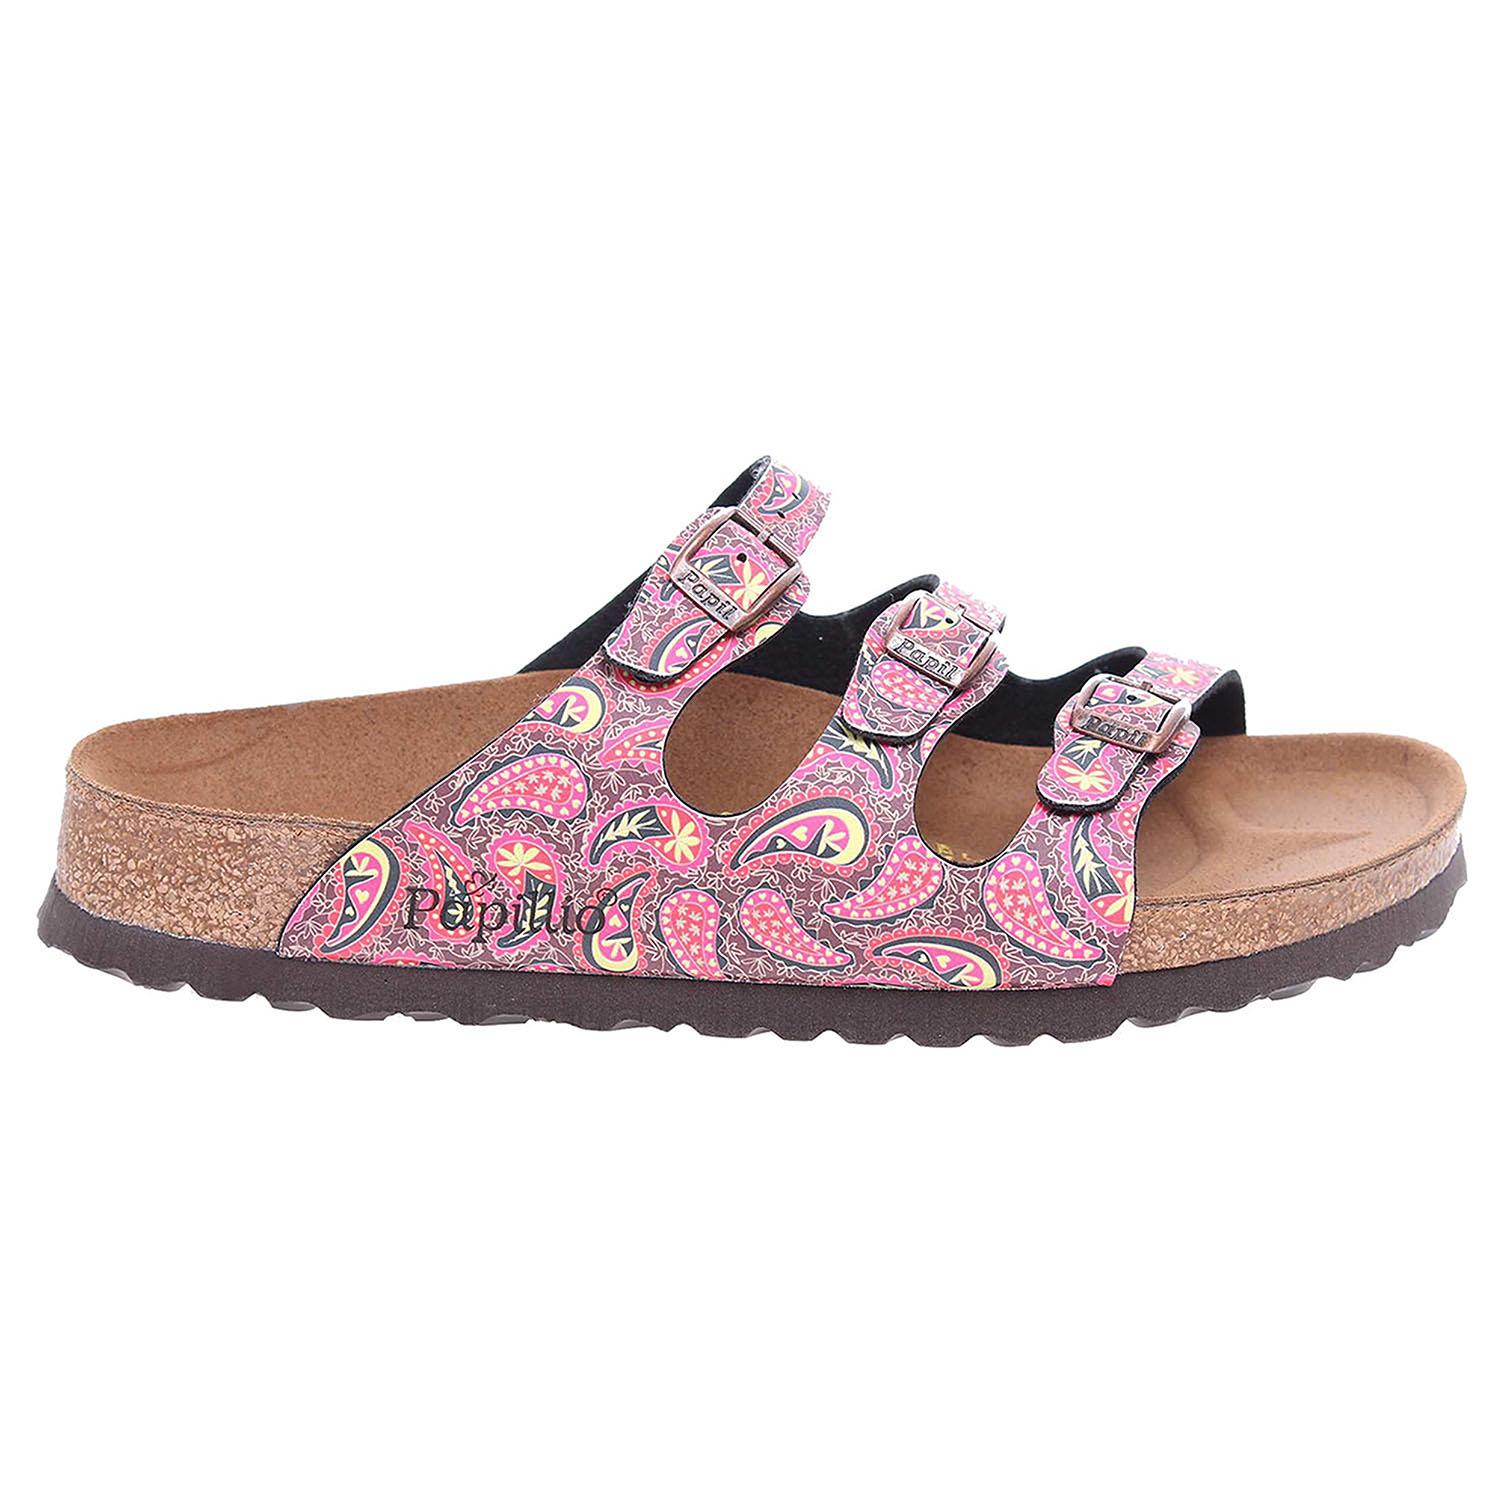 Ecco Papillio Florida dámské pantofle 321363 růžové 23400302 f2526428ad1